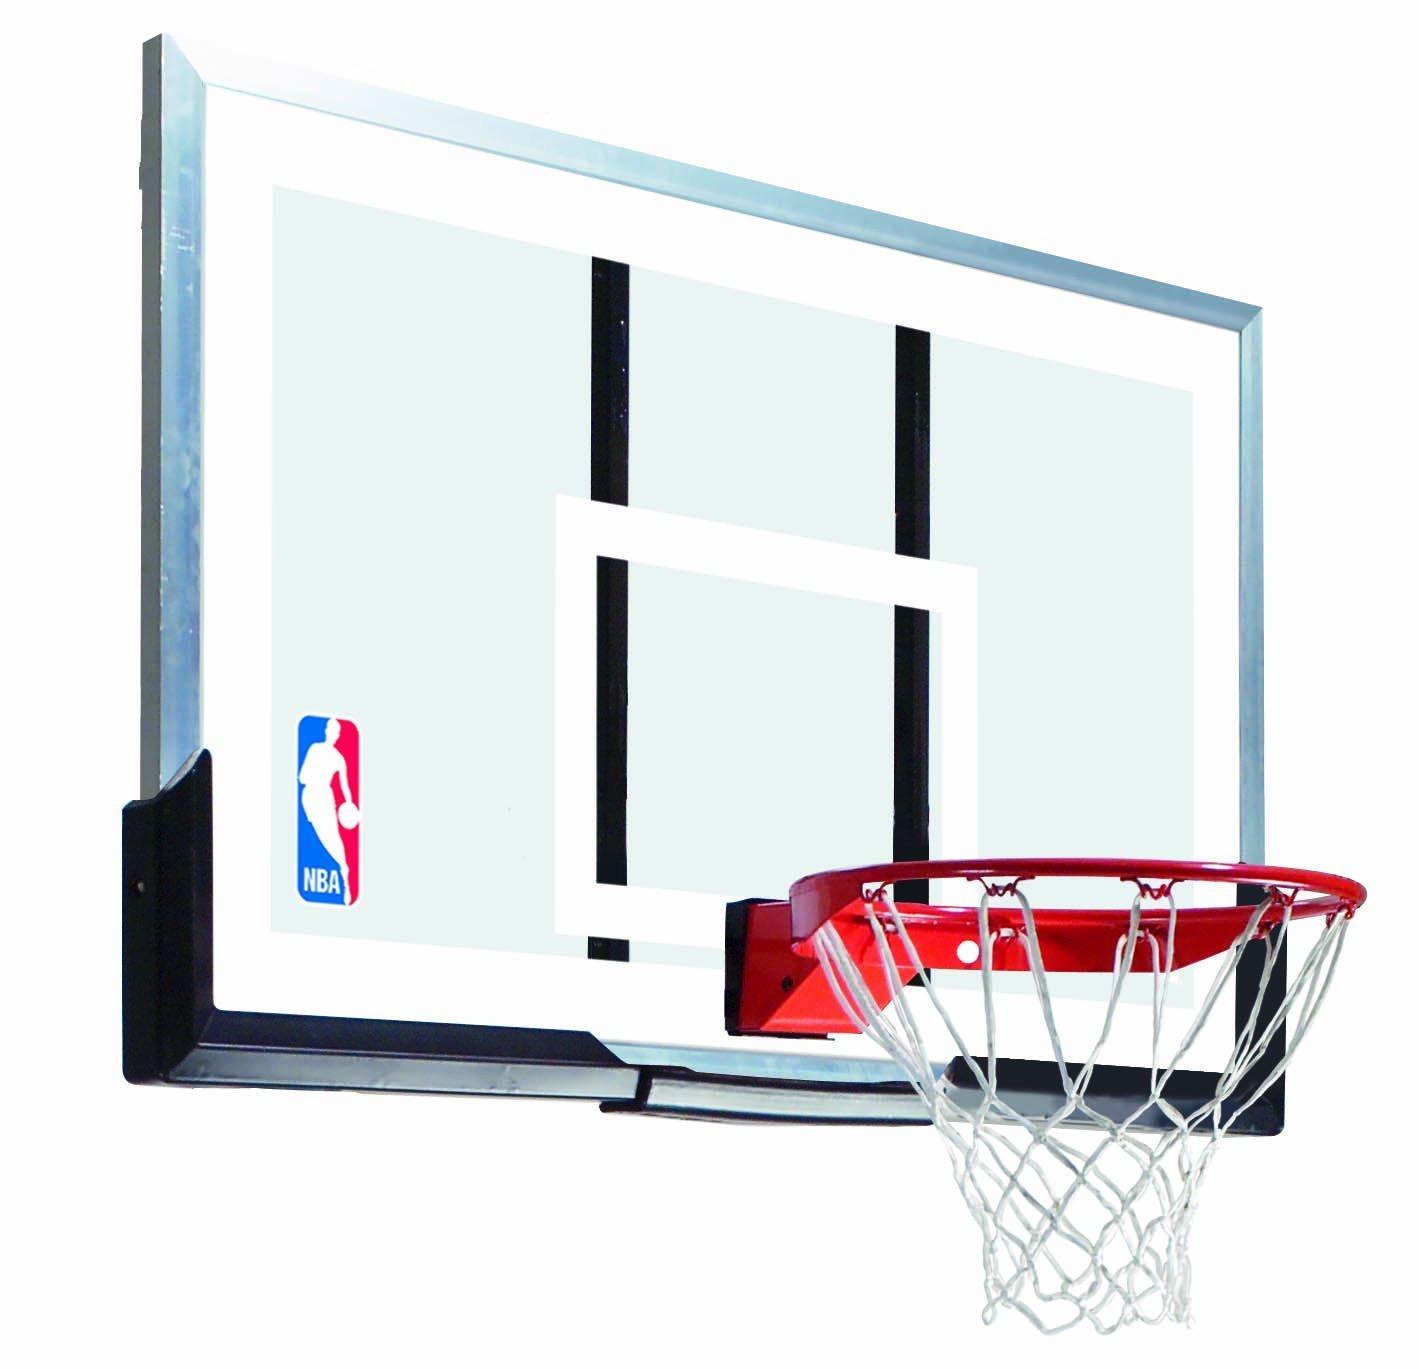 GREEM MARKET(グリームマーケット) Spalding 海外モデル バスケットゴール ボード リング NBAバックボード リムコンボ アクリルバックボード 137cm GMUA-1872 B07DVPB3R1